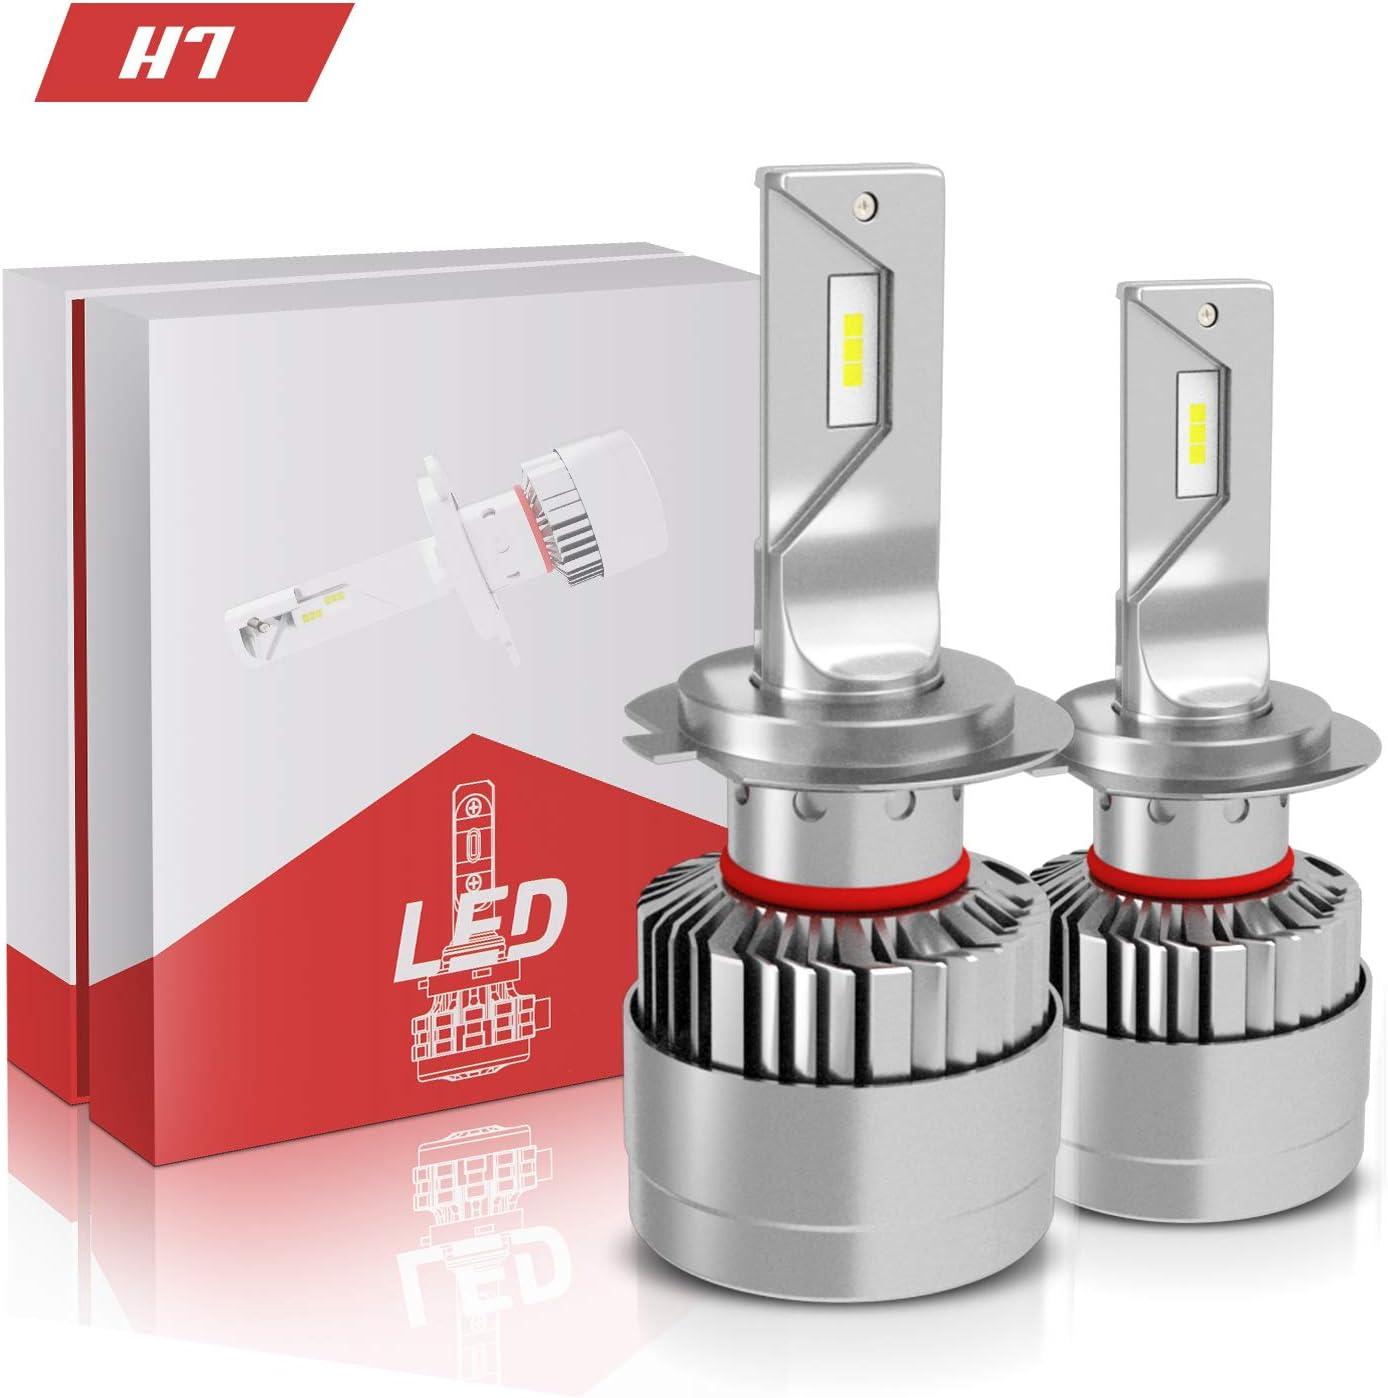 AUSI H7 LED Headlight Bulbs Super Bright Conversion Kit 8400LM 6000K Brightness Ice White CSP Chips Adjustable High/Low Beam 2 Pack